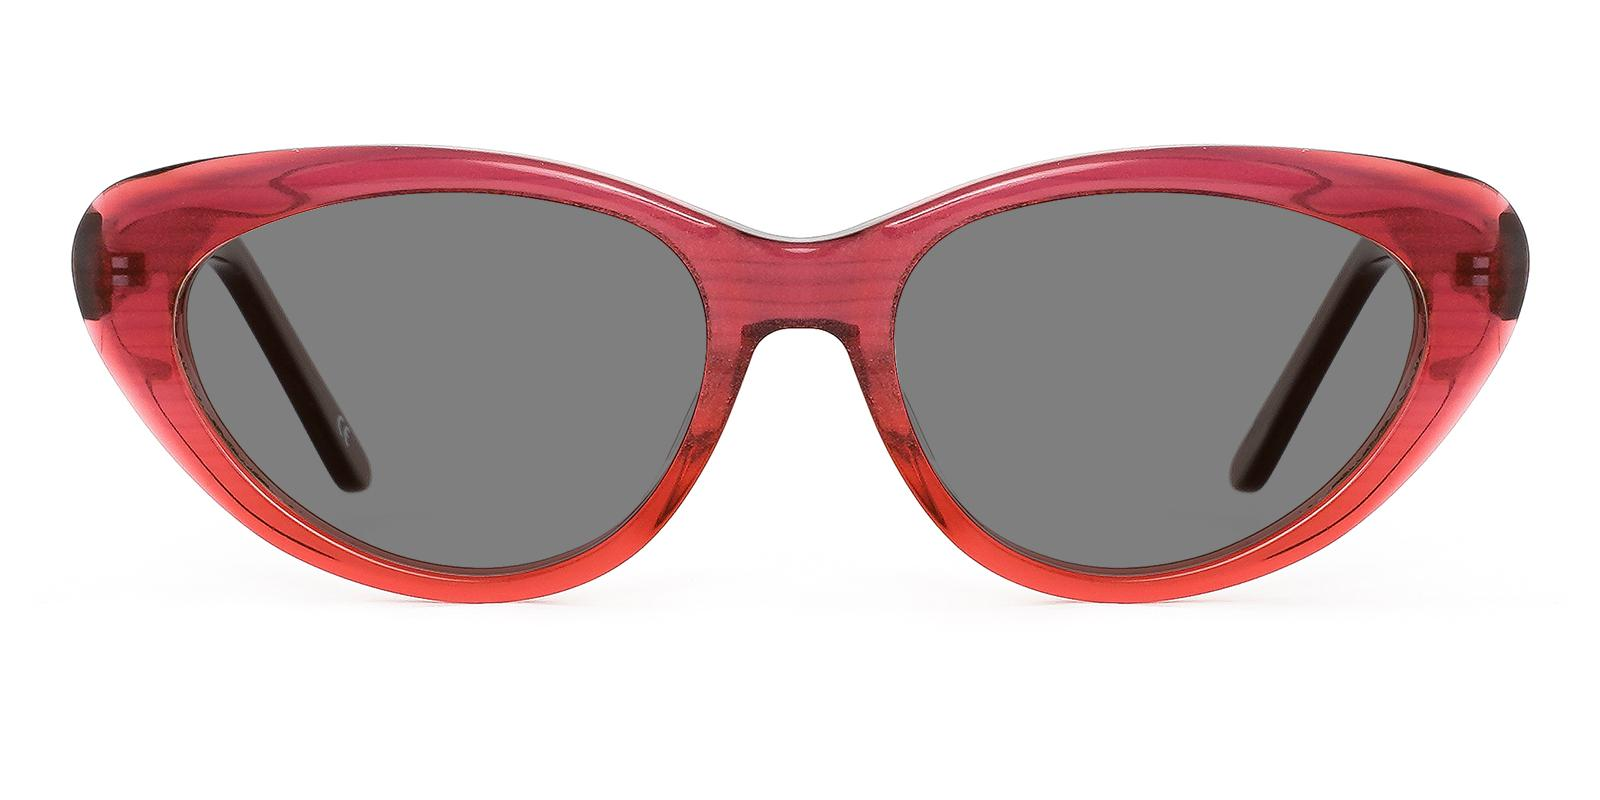 Botanist Red Acetate SpringHinges , Sunglasses , UniversalBridgeFit Frames from ABBE Glasses